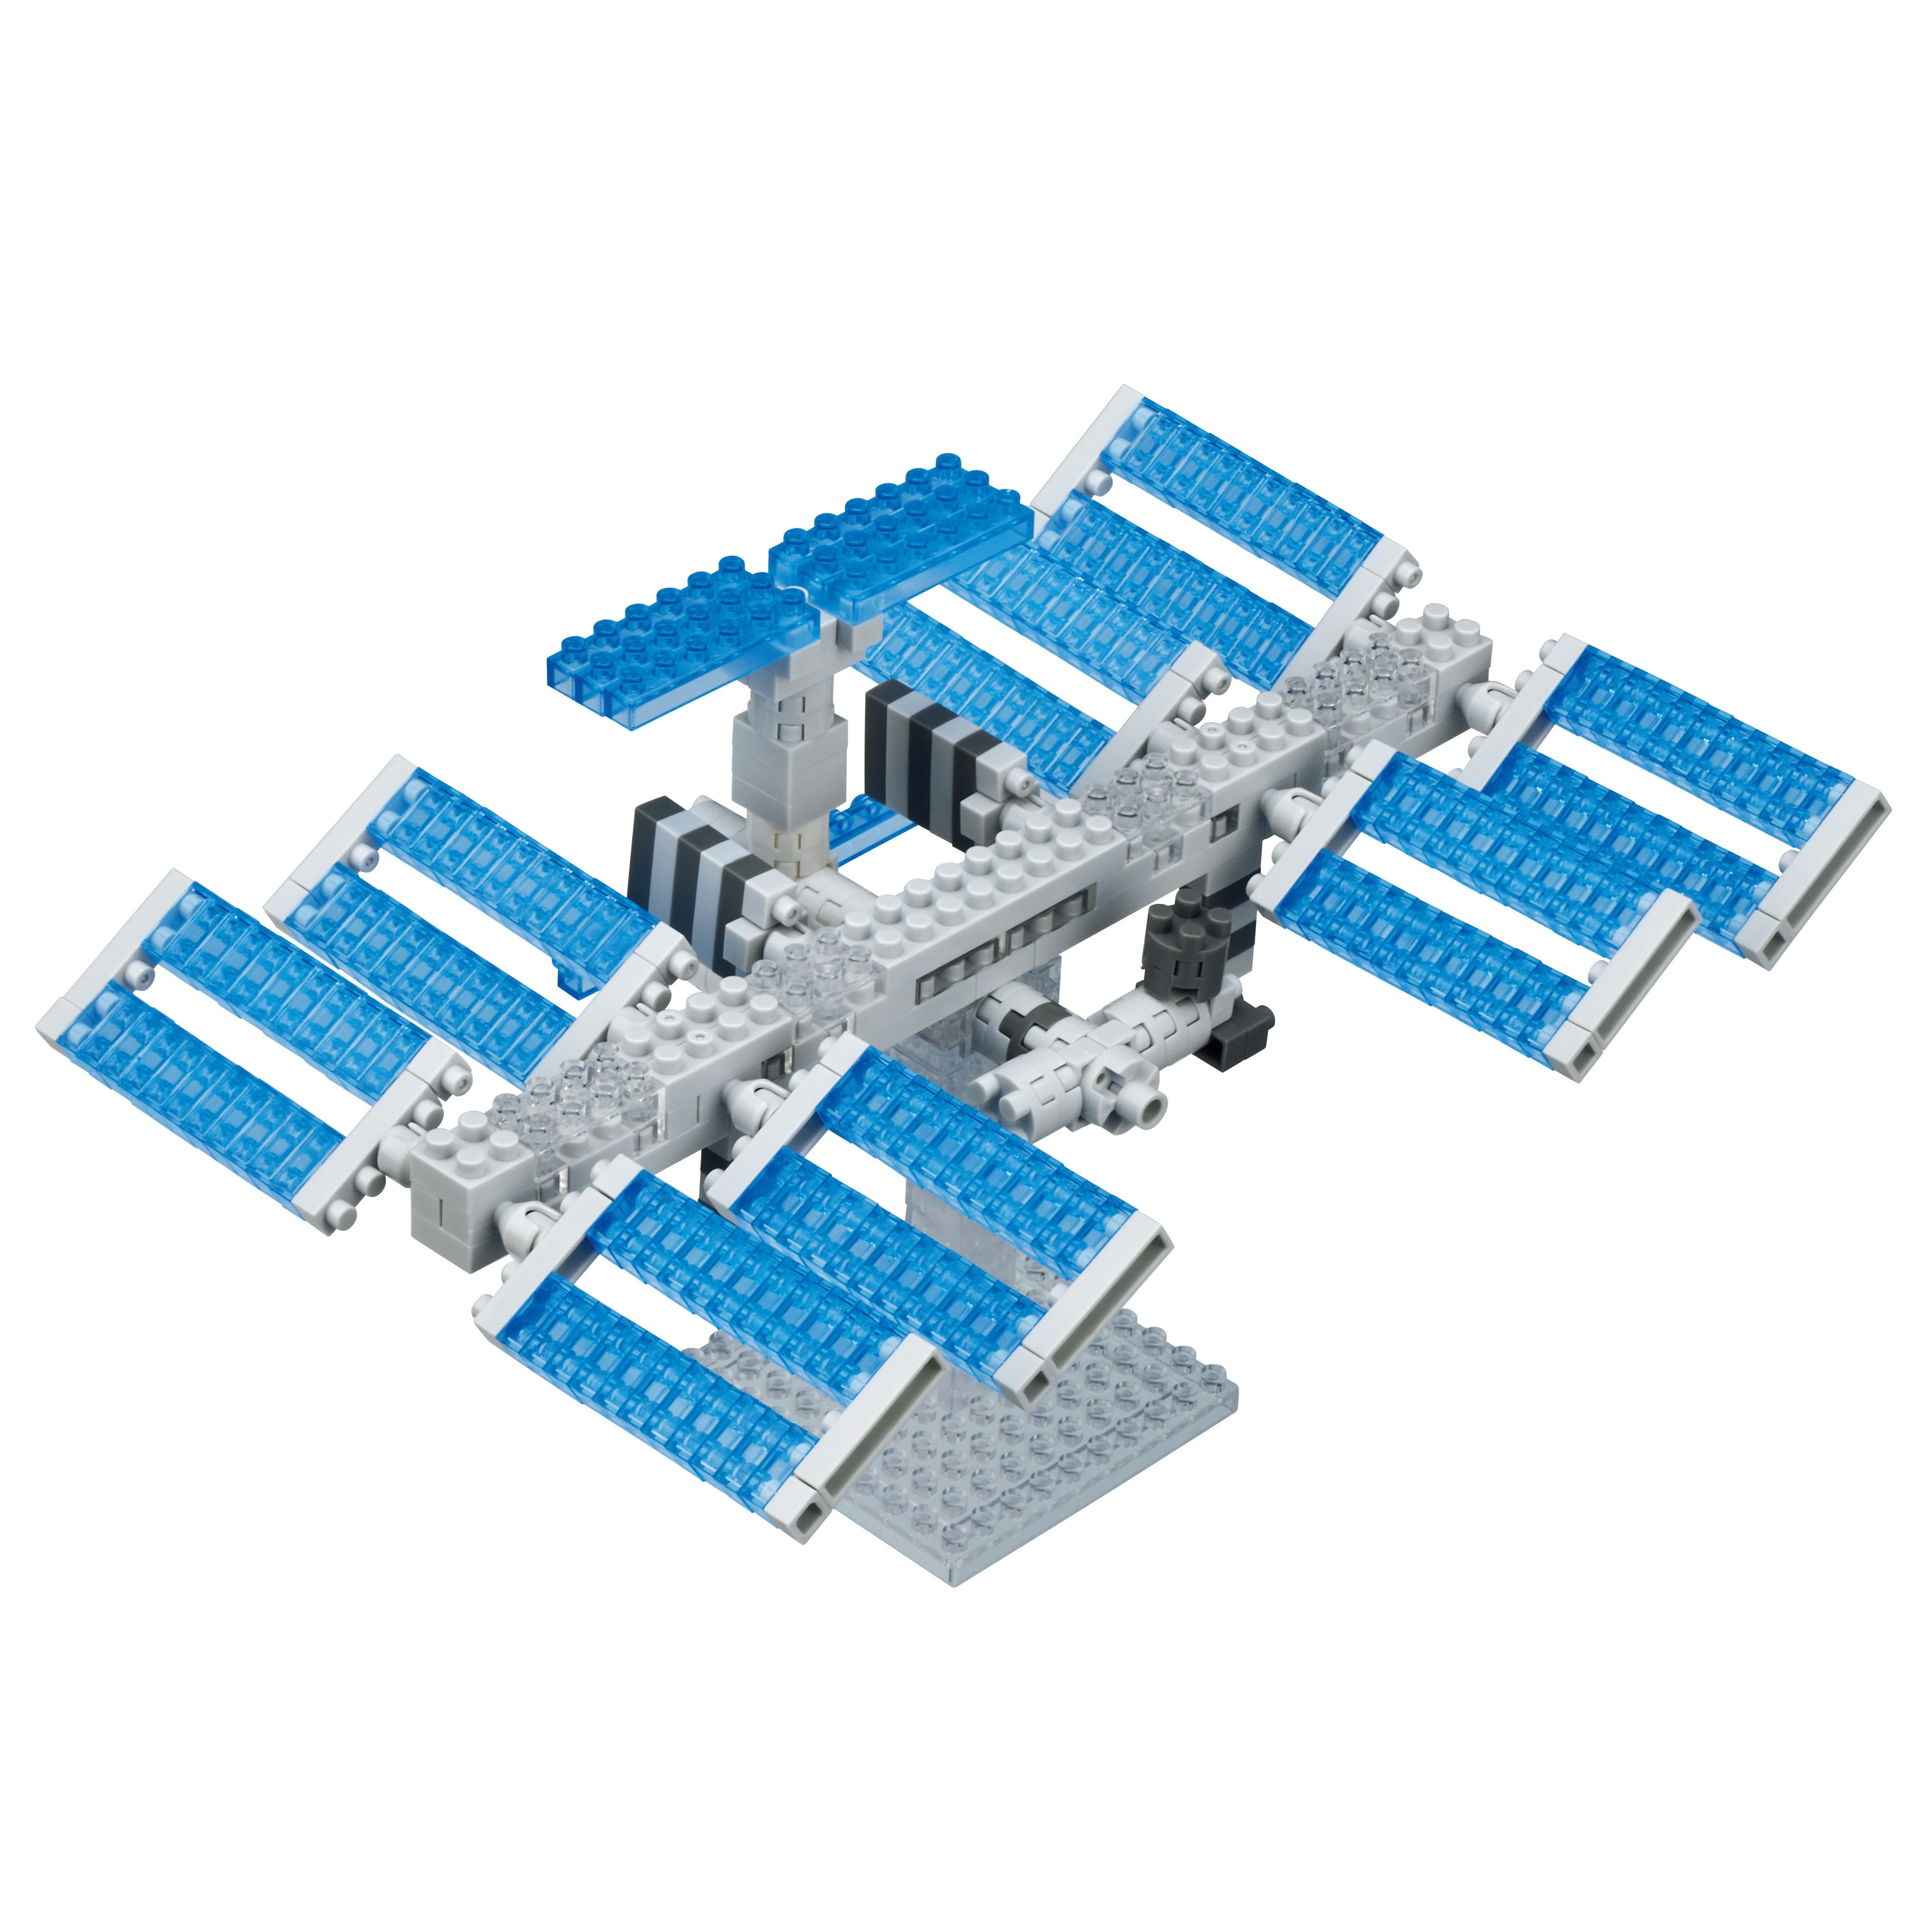 Buy Nanoblock International Space Station Kit From Science